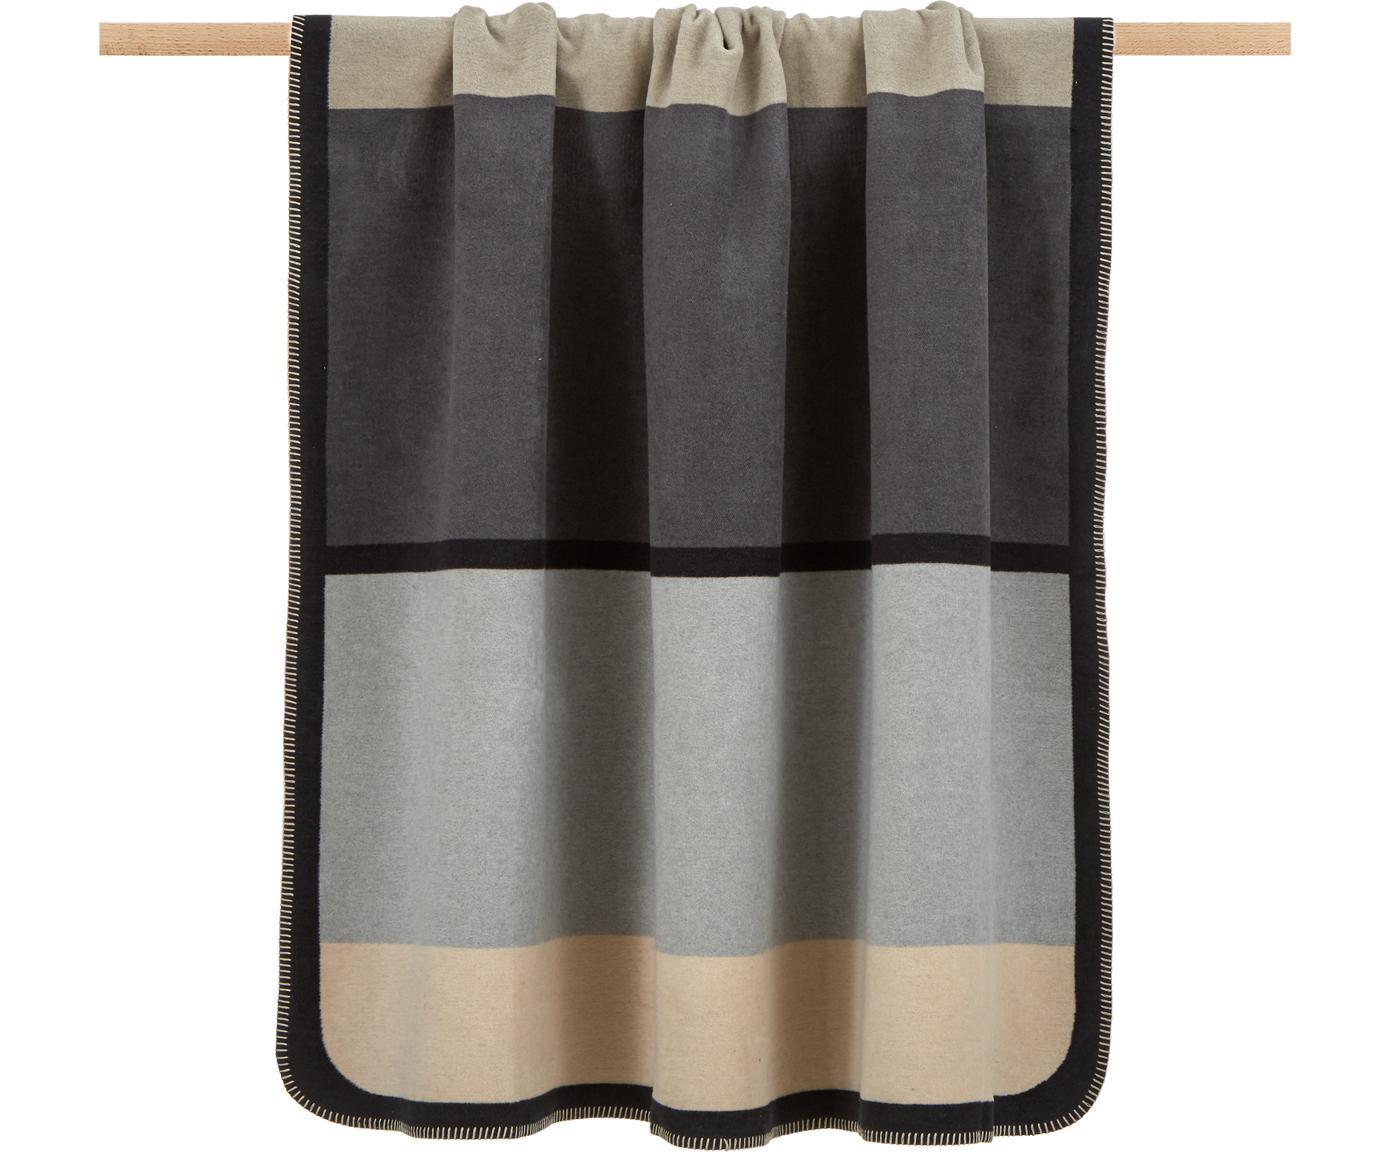 Plaid reversibile Deux, 65% cotone, 35% poliacrilico, Grigio, nero, beige, P 150 x L 200 cm